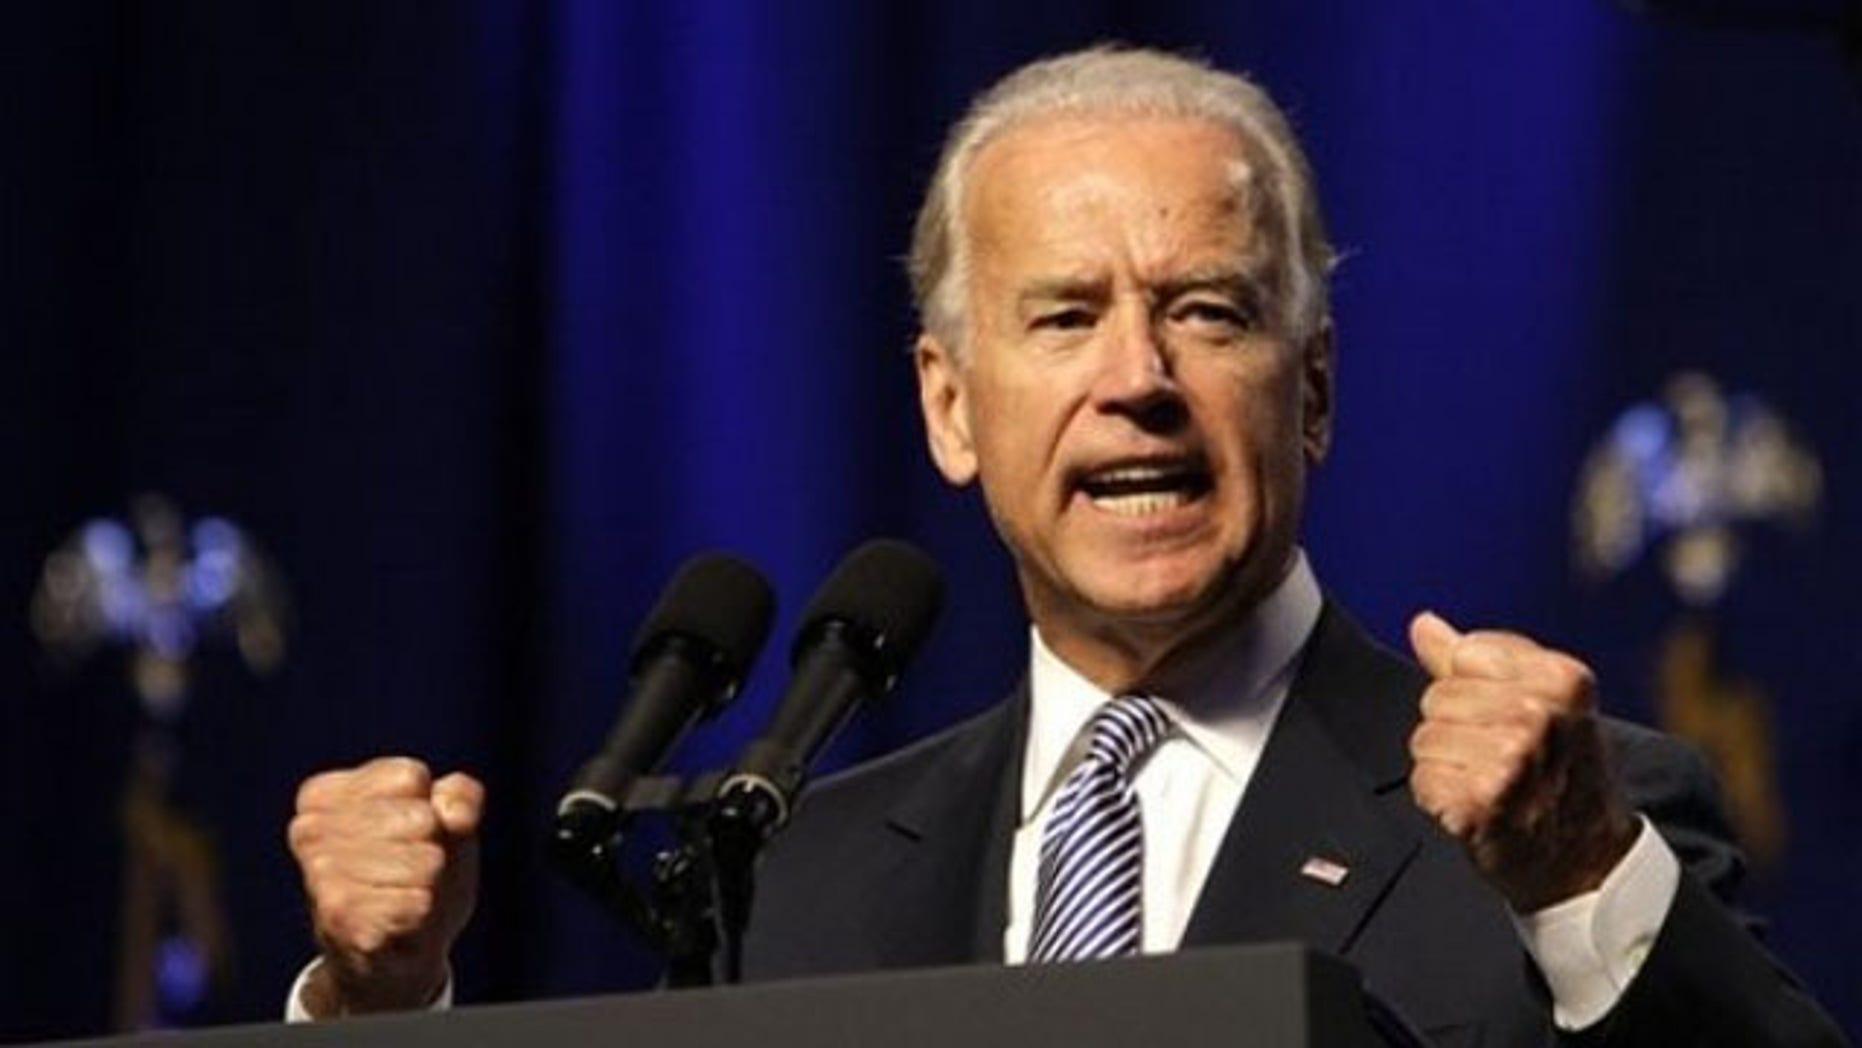 Vice President Biden speaks at the Ohio Democratic Party's annual state dinner June 25 in Columbus, Ohio.